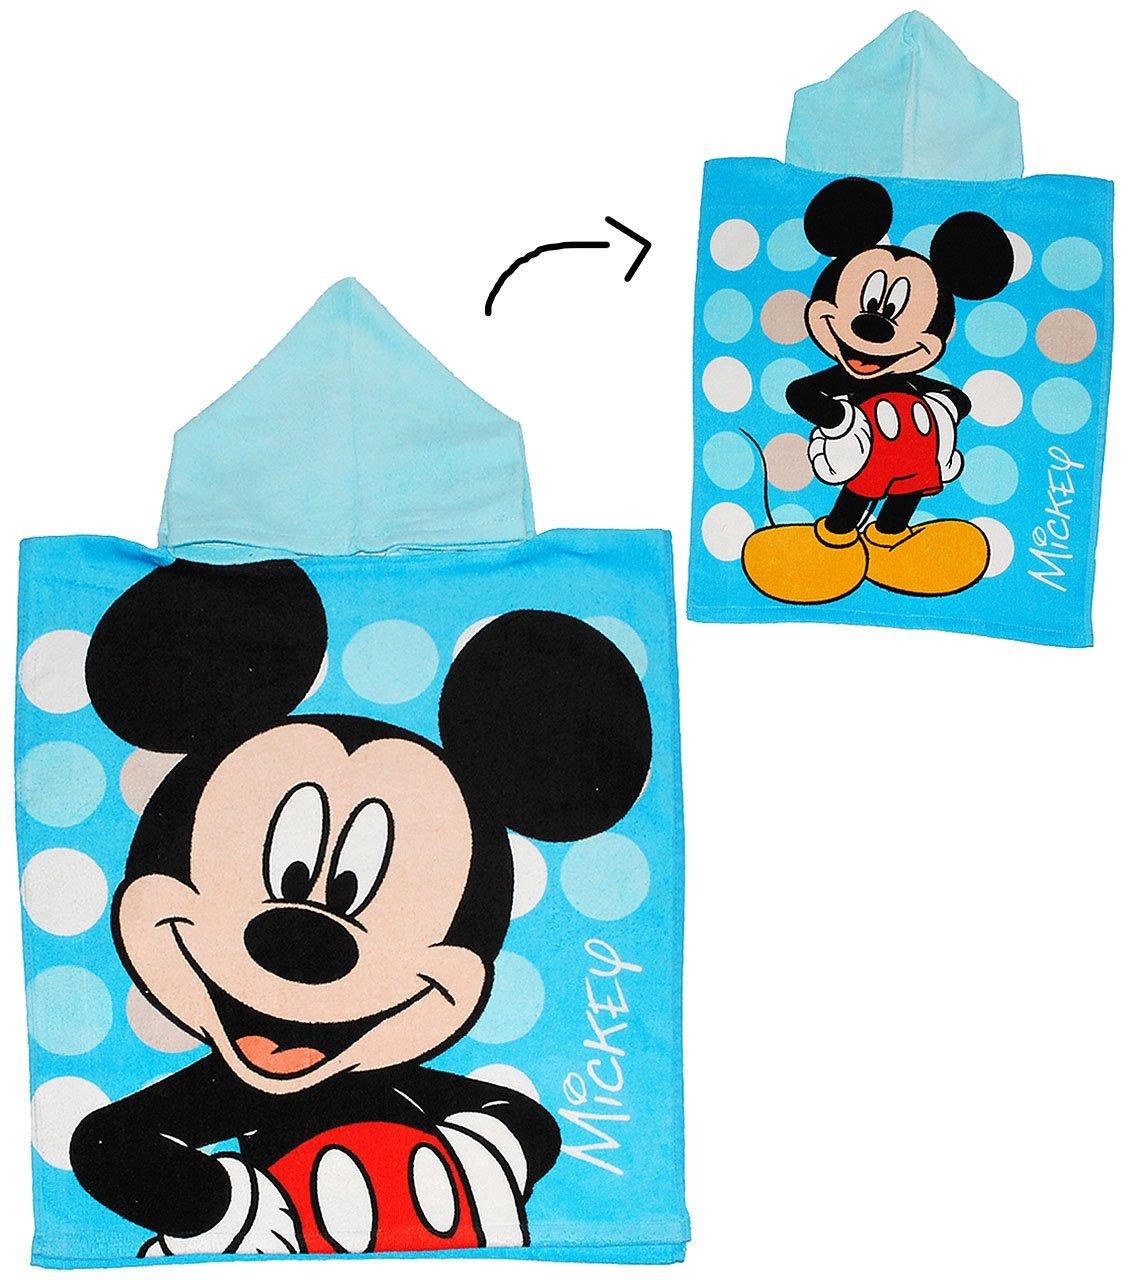 alles-meine.de GmbH Badeponcho Handtuch Strandtuch Baumwolle Disney Mickey Mouse incl 50 cm * 115 cm mit Kapuze Jungen Maus // Playhou.. Name 4 bis 8 Jahre Poncho